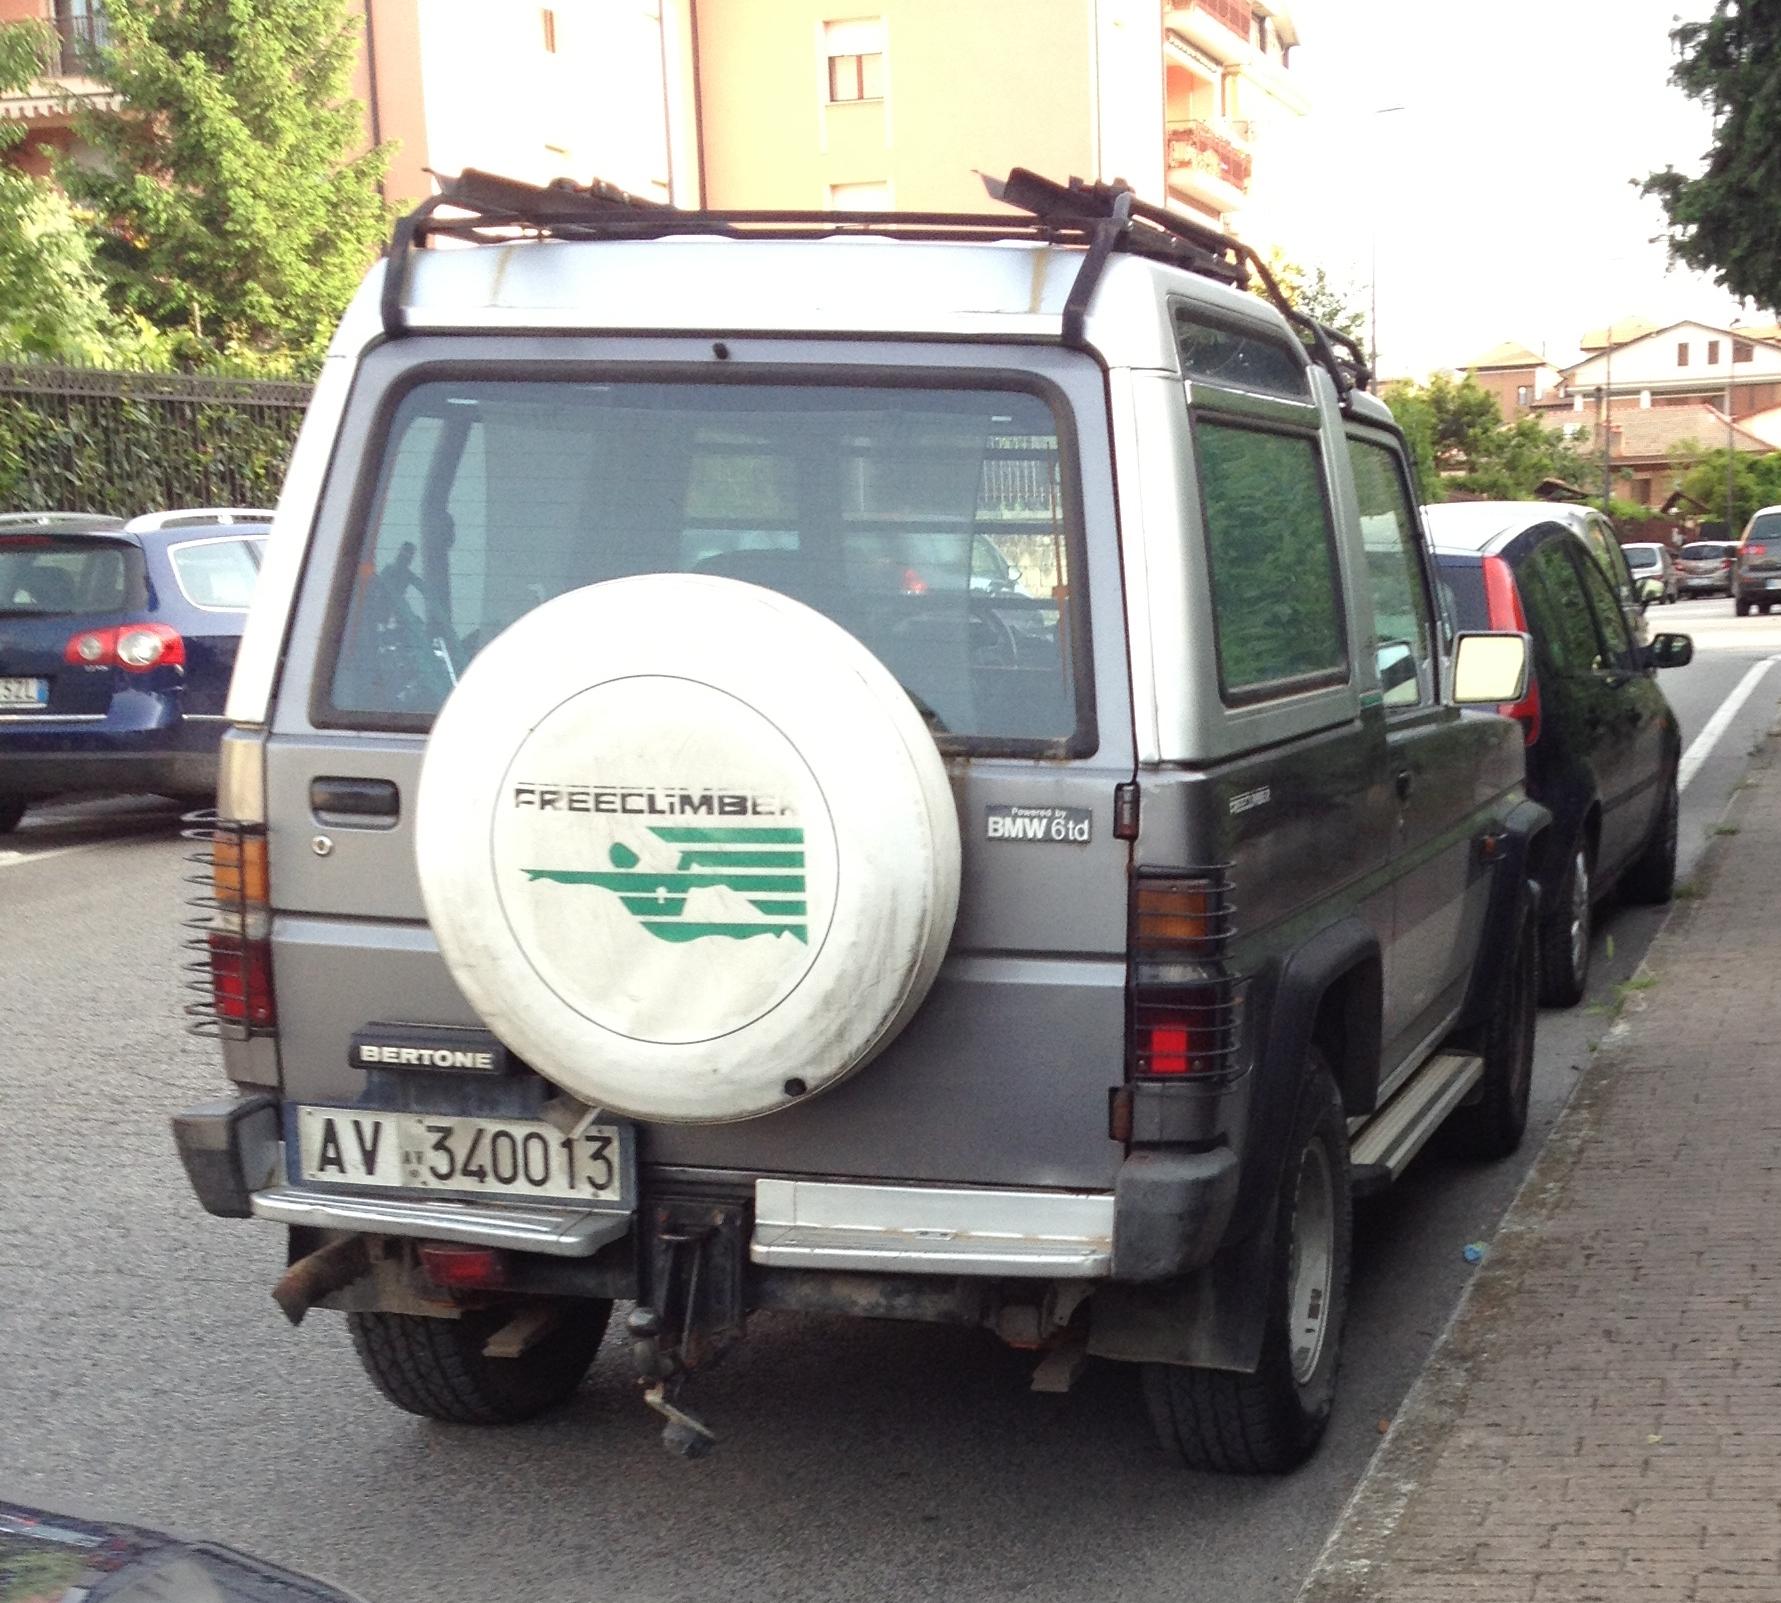 Daihatsu Rugger Wikipedia Wiring Diagram Taft Rocky Bertone Freeclimberedit